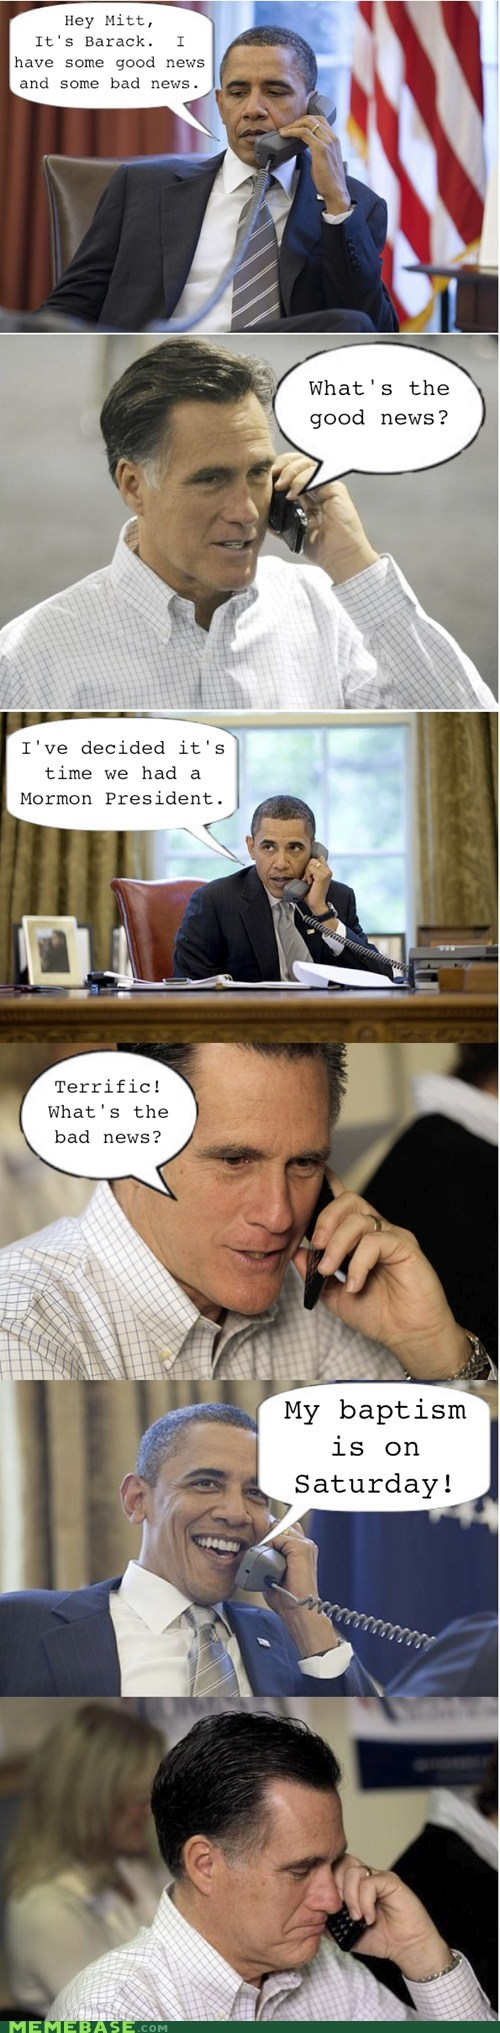 2012 Presidential Campaig barack obama mormon politics president